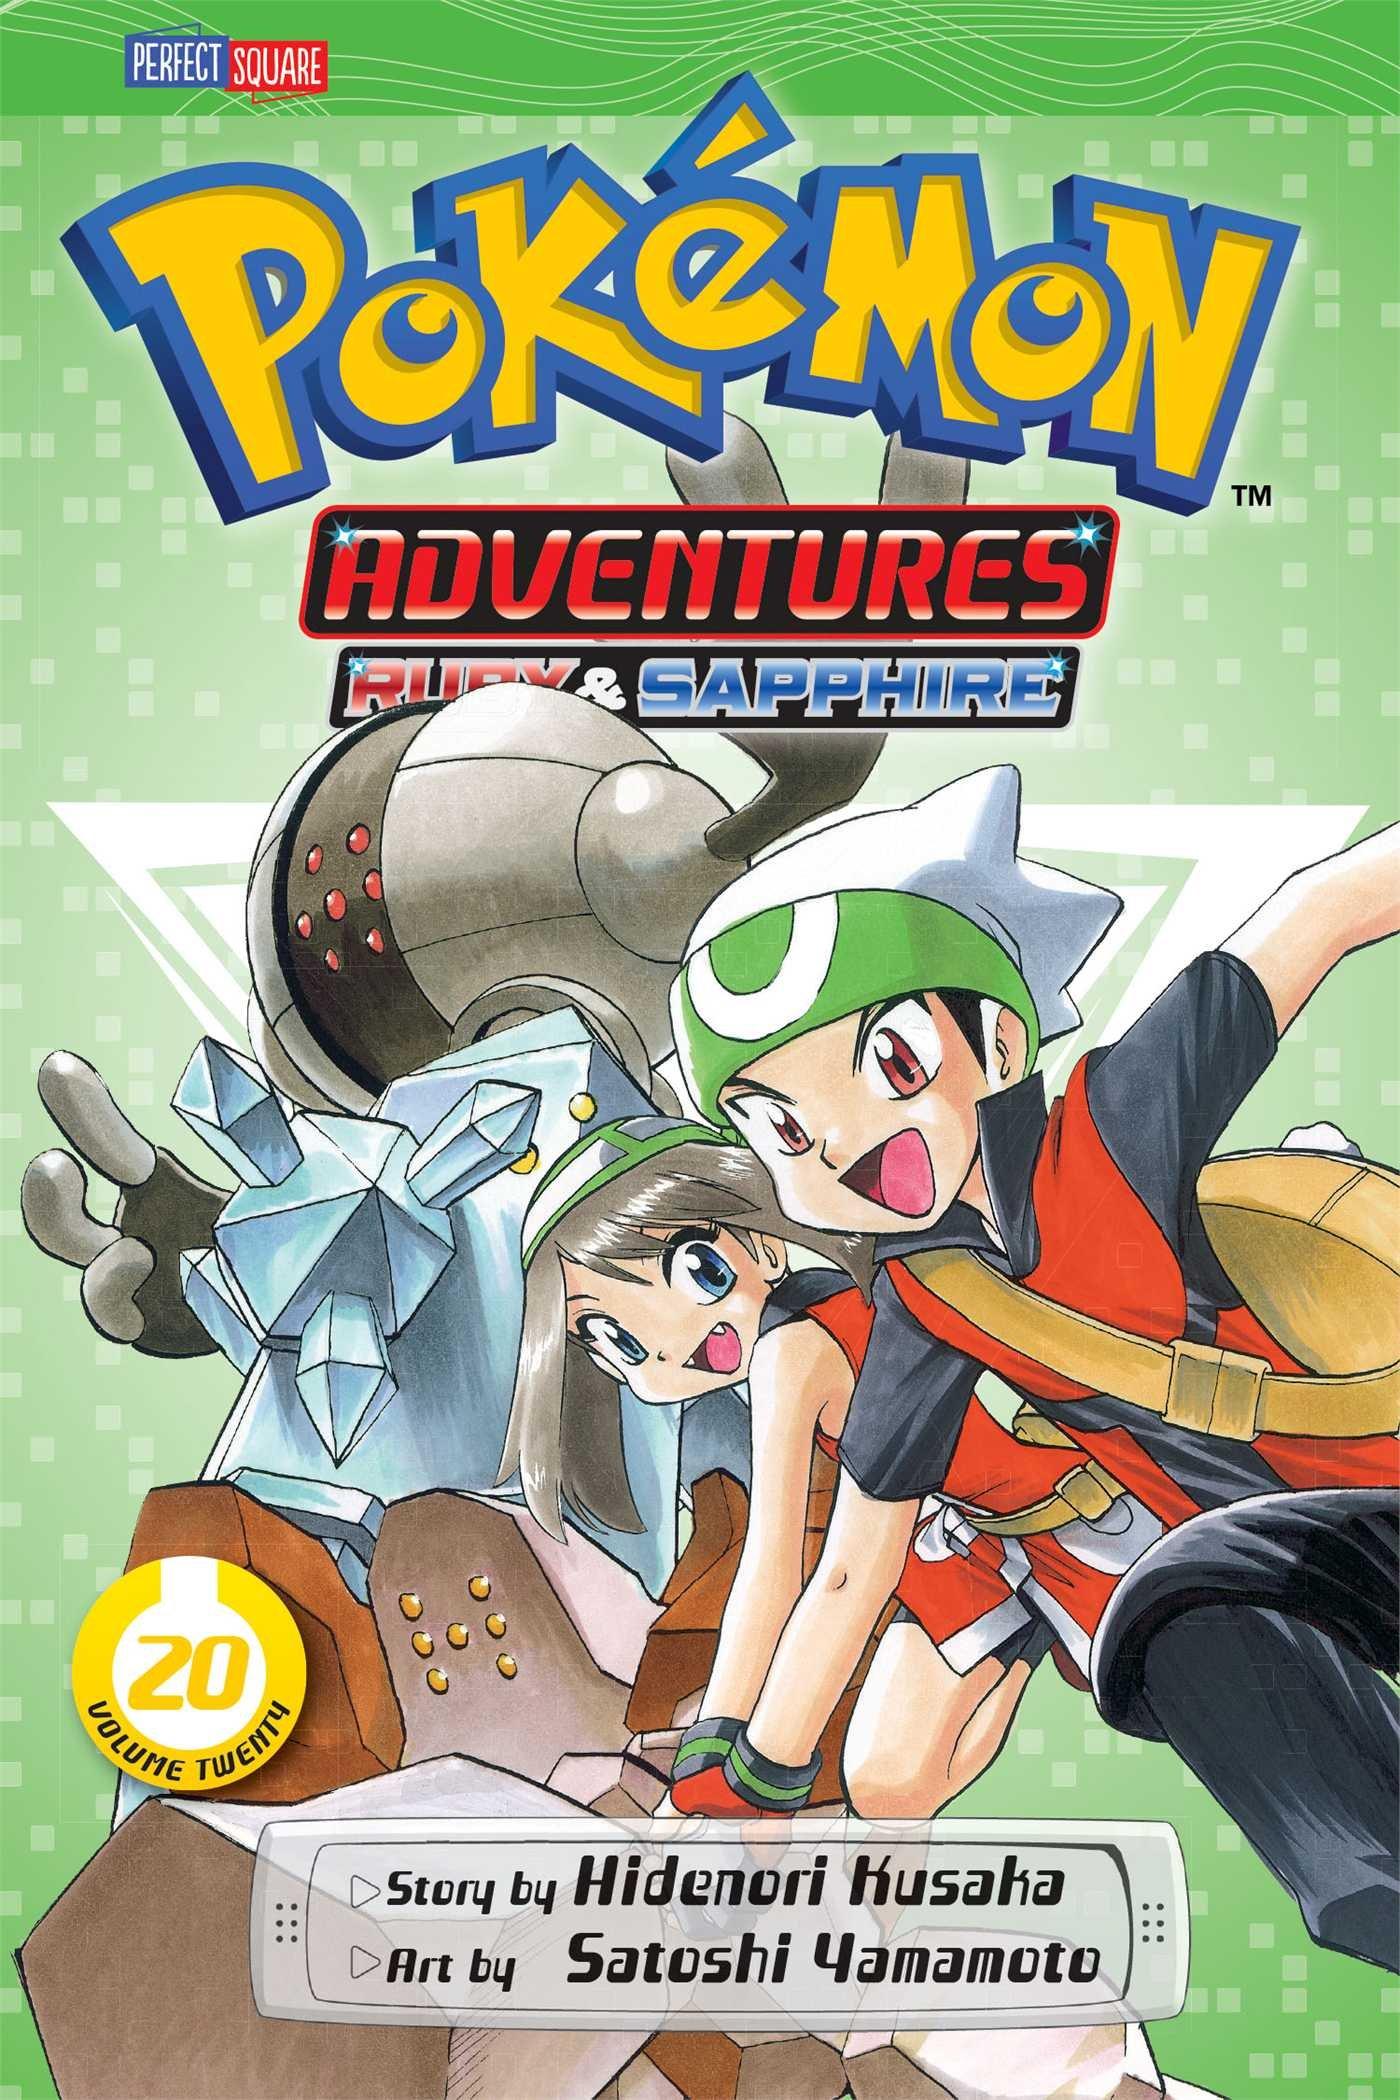 Pokémon Adventures (Ruby and Sapphire), Vol. 20 (Pokemon) pdf